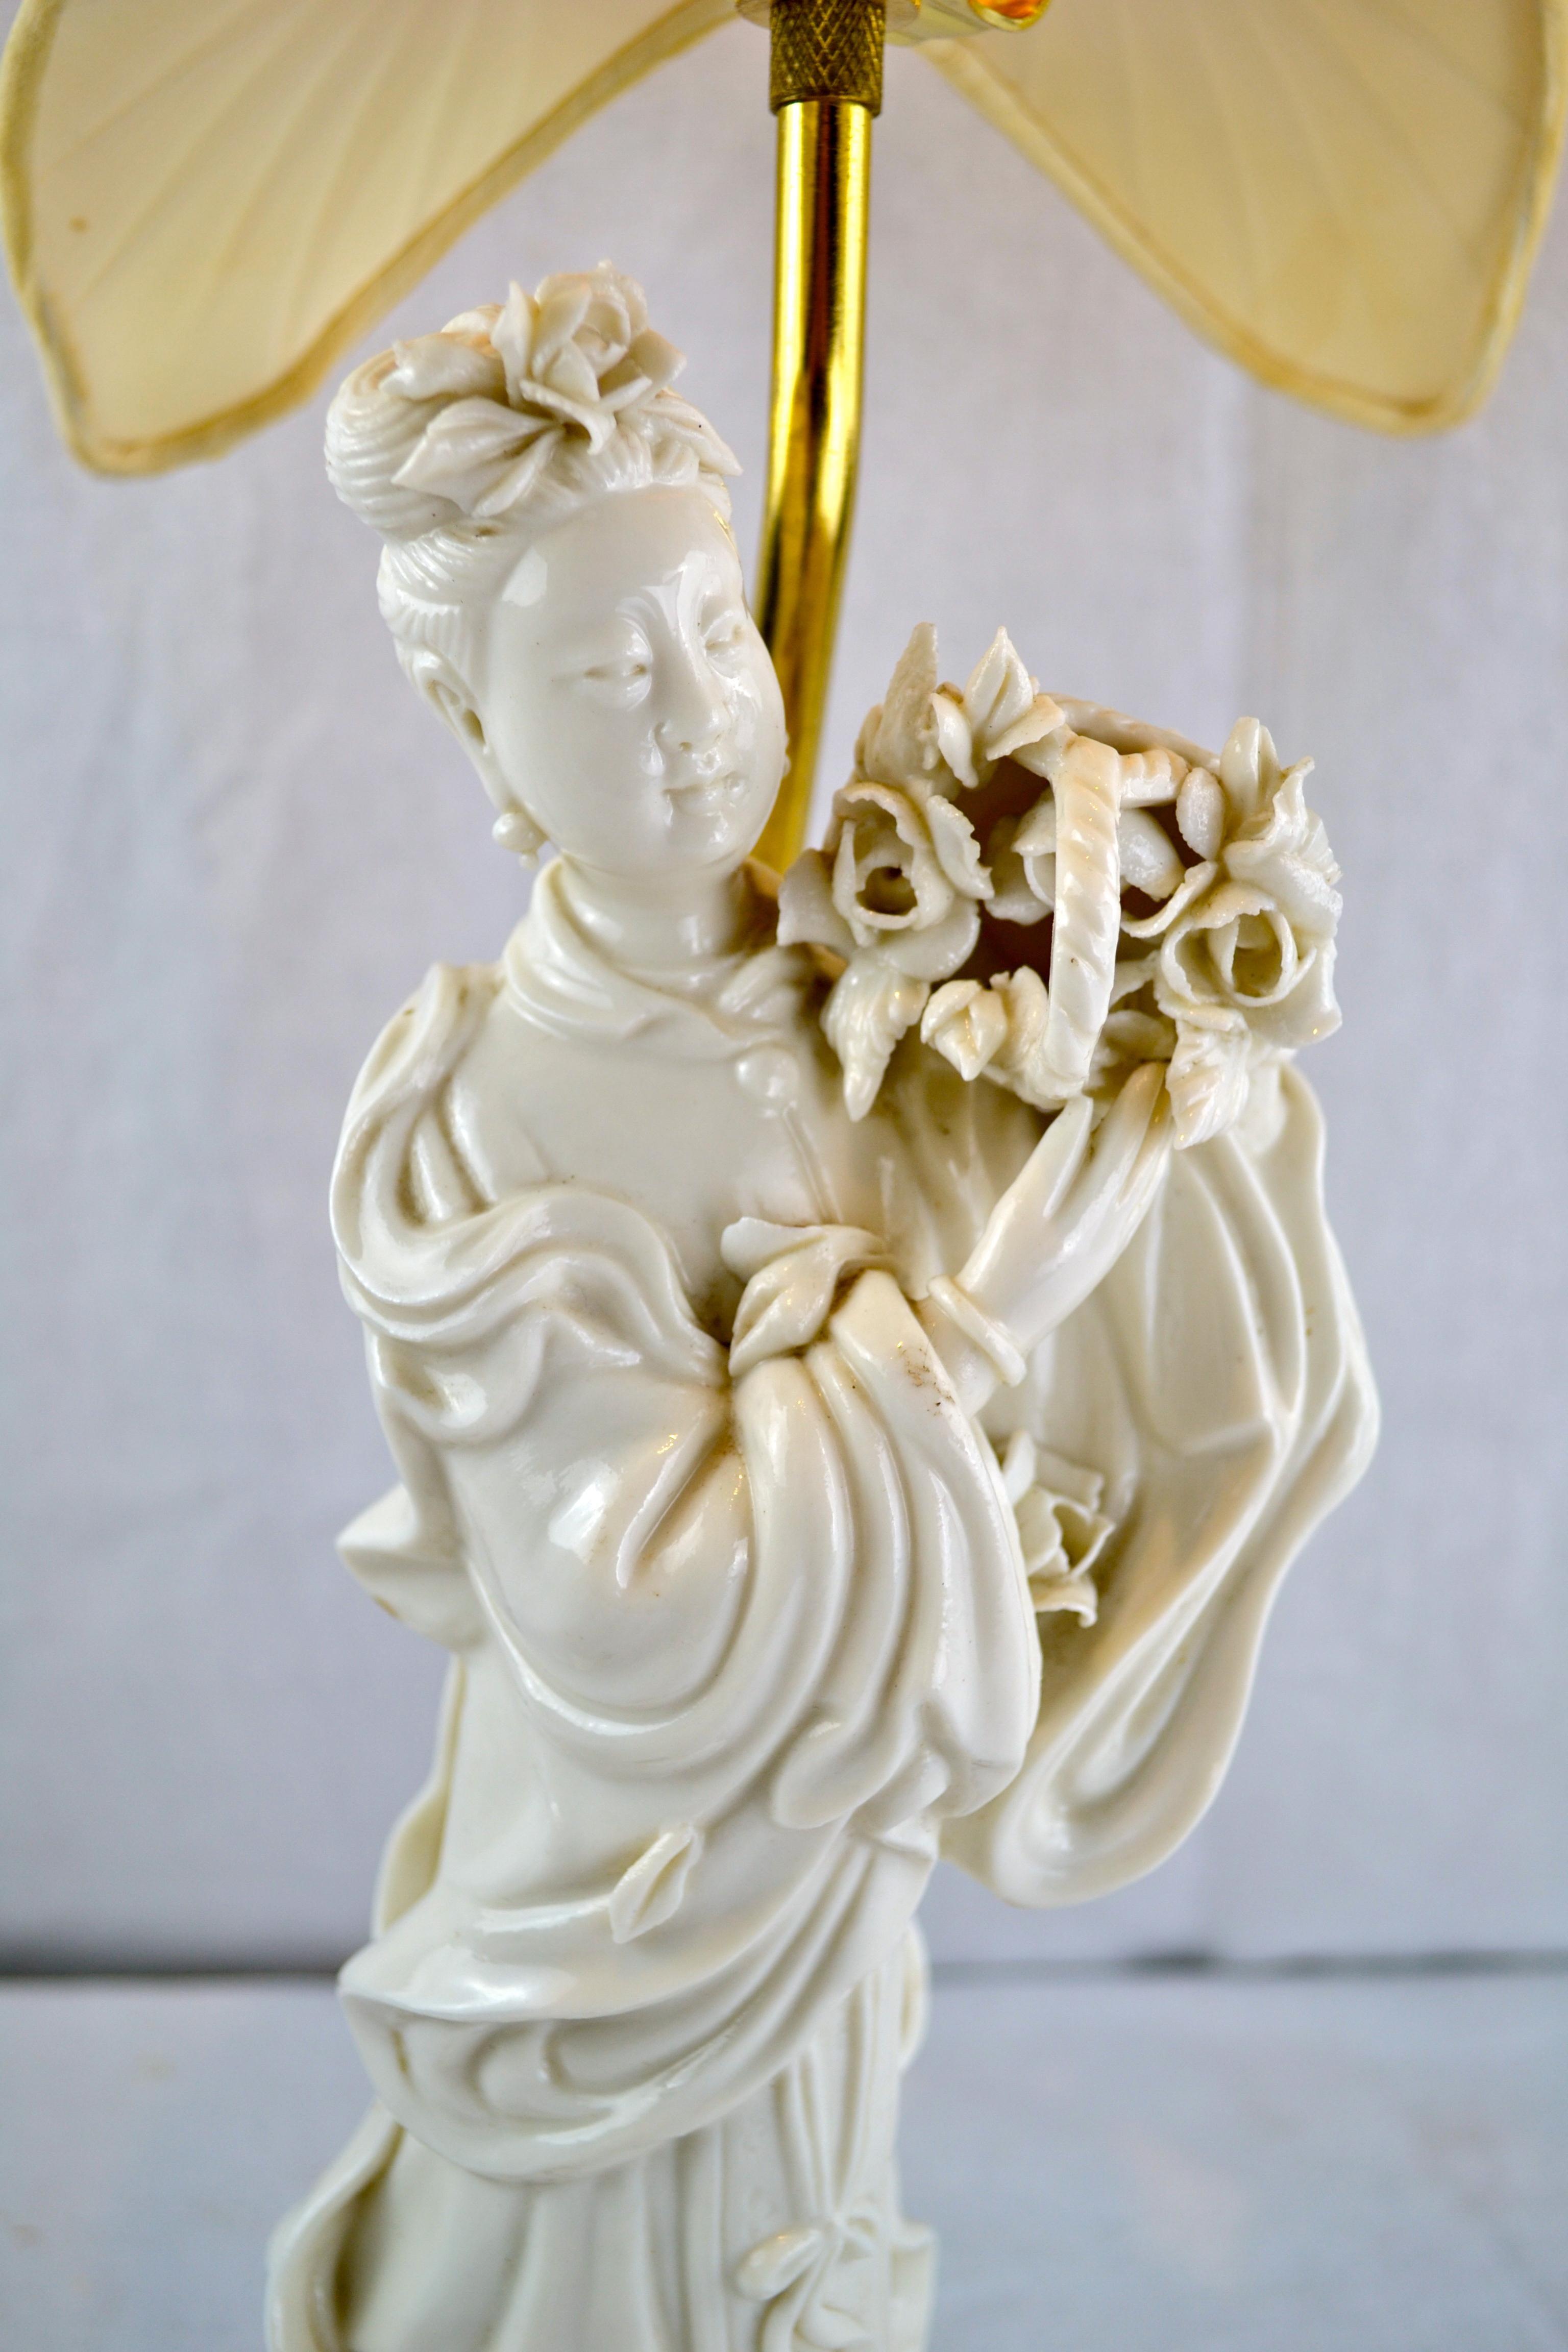 Figural Blanc De Chine Lamp Of Quan Yin With An Silk Lotus Flower